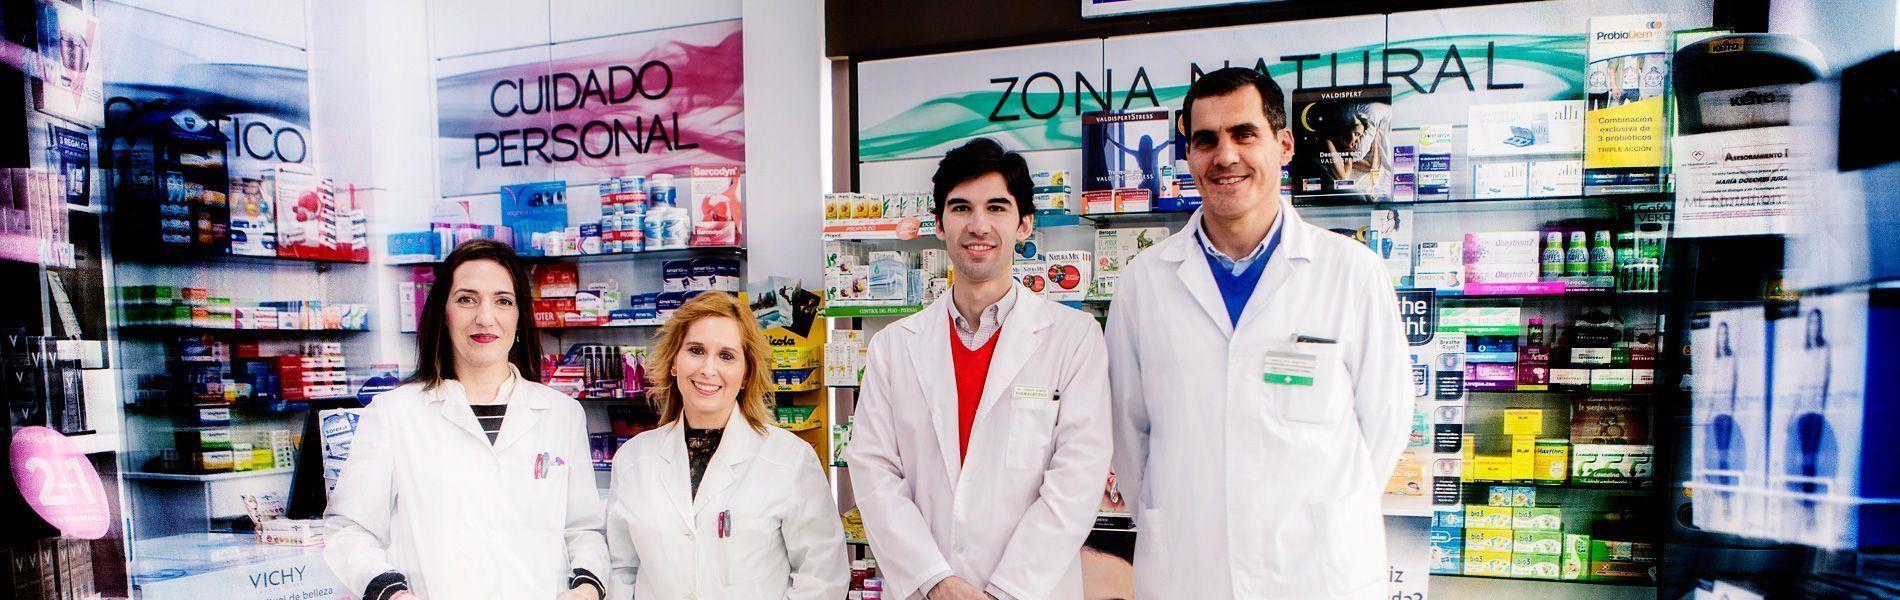 Inicio famarcia-rescatado-slide-farmacia